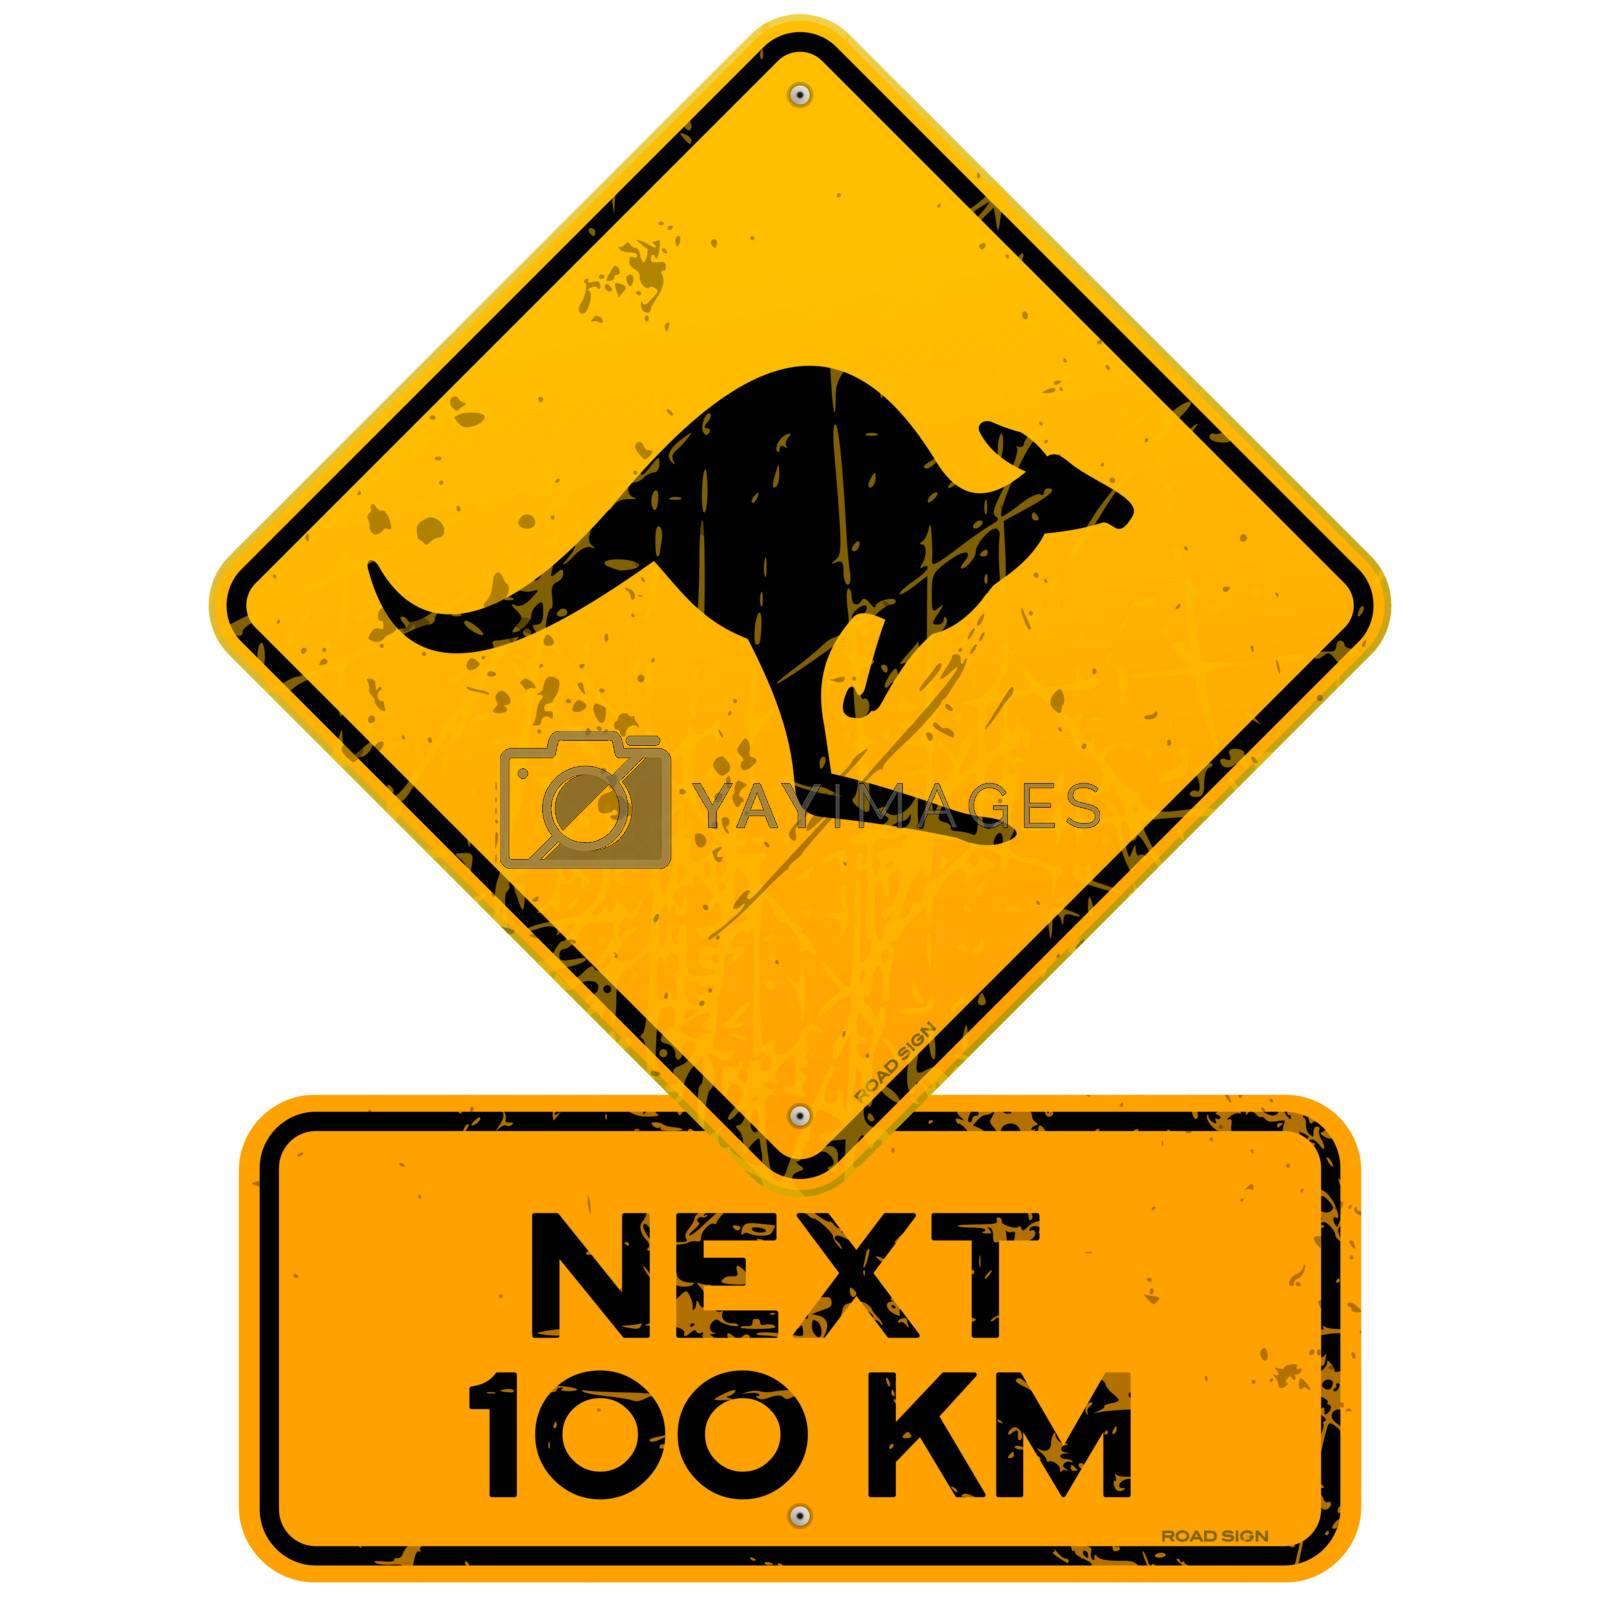 Yellow Kangaroo roadsign with next 100 km additional table